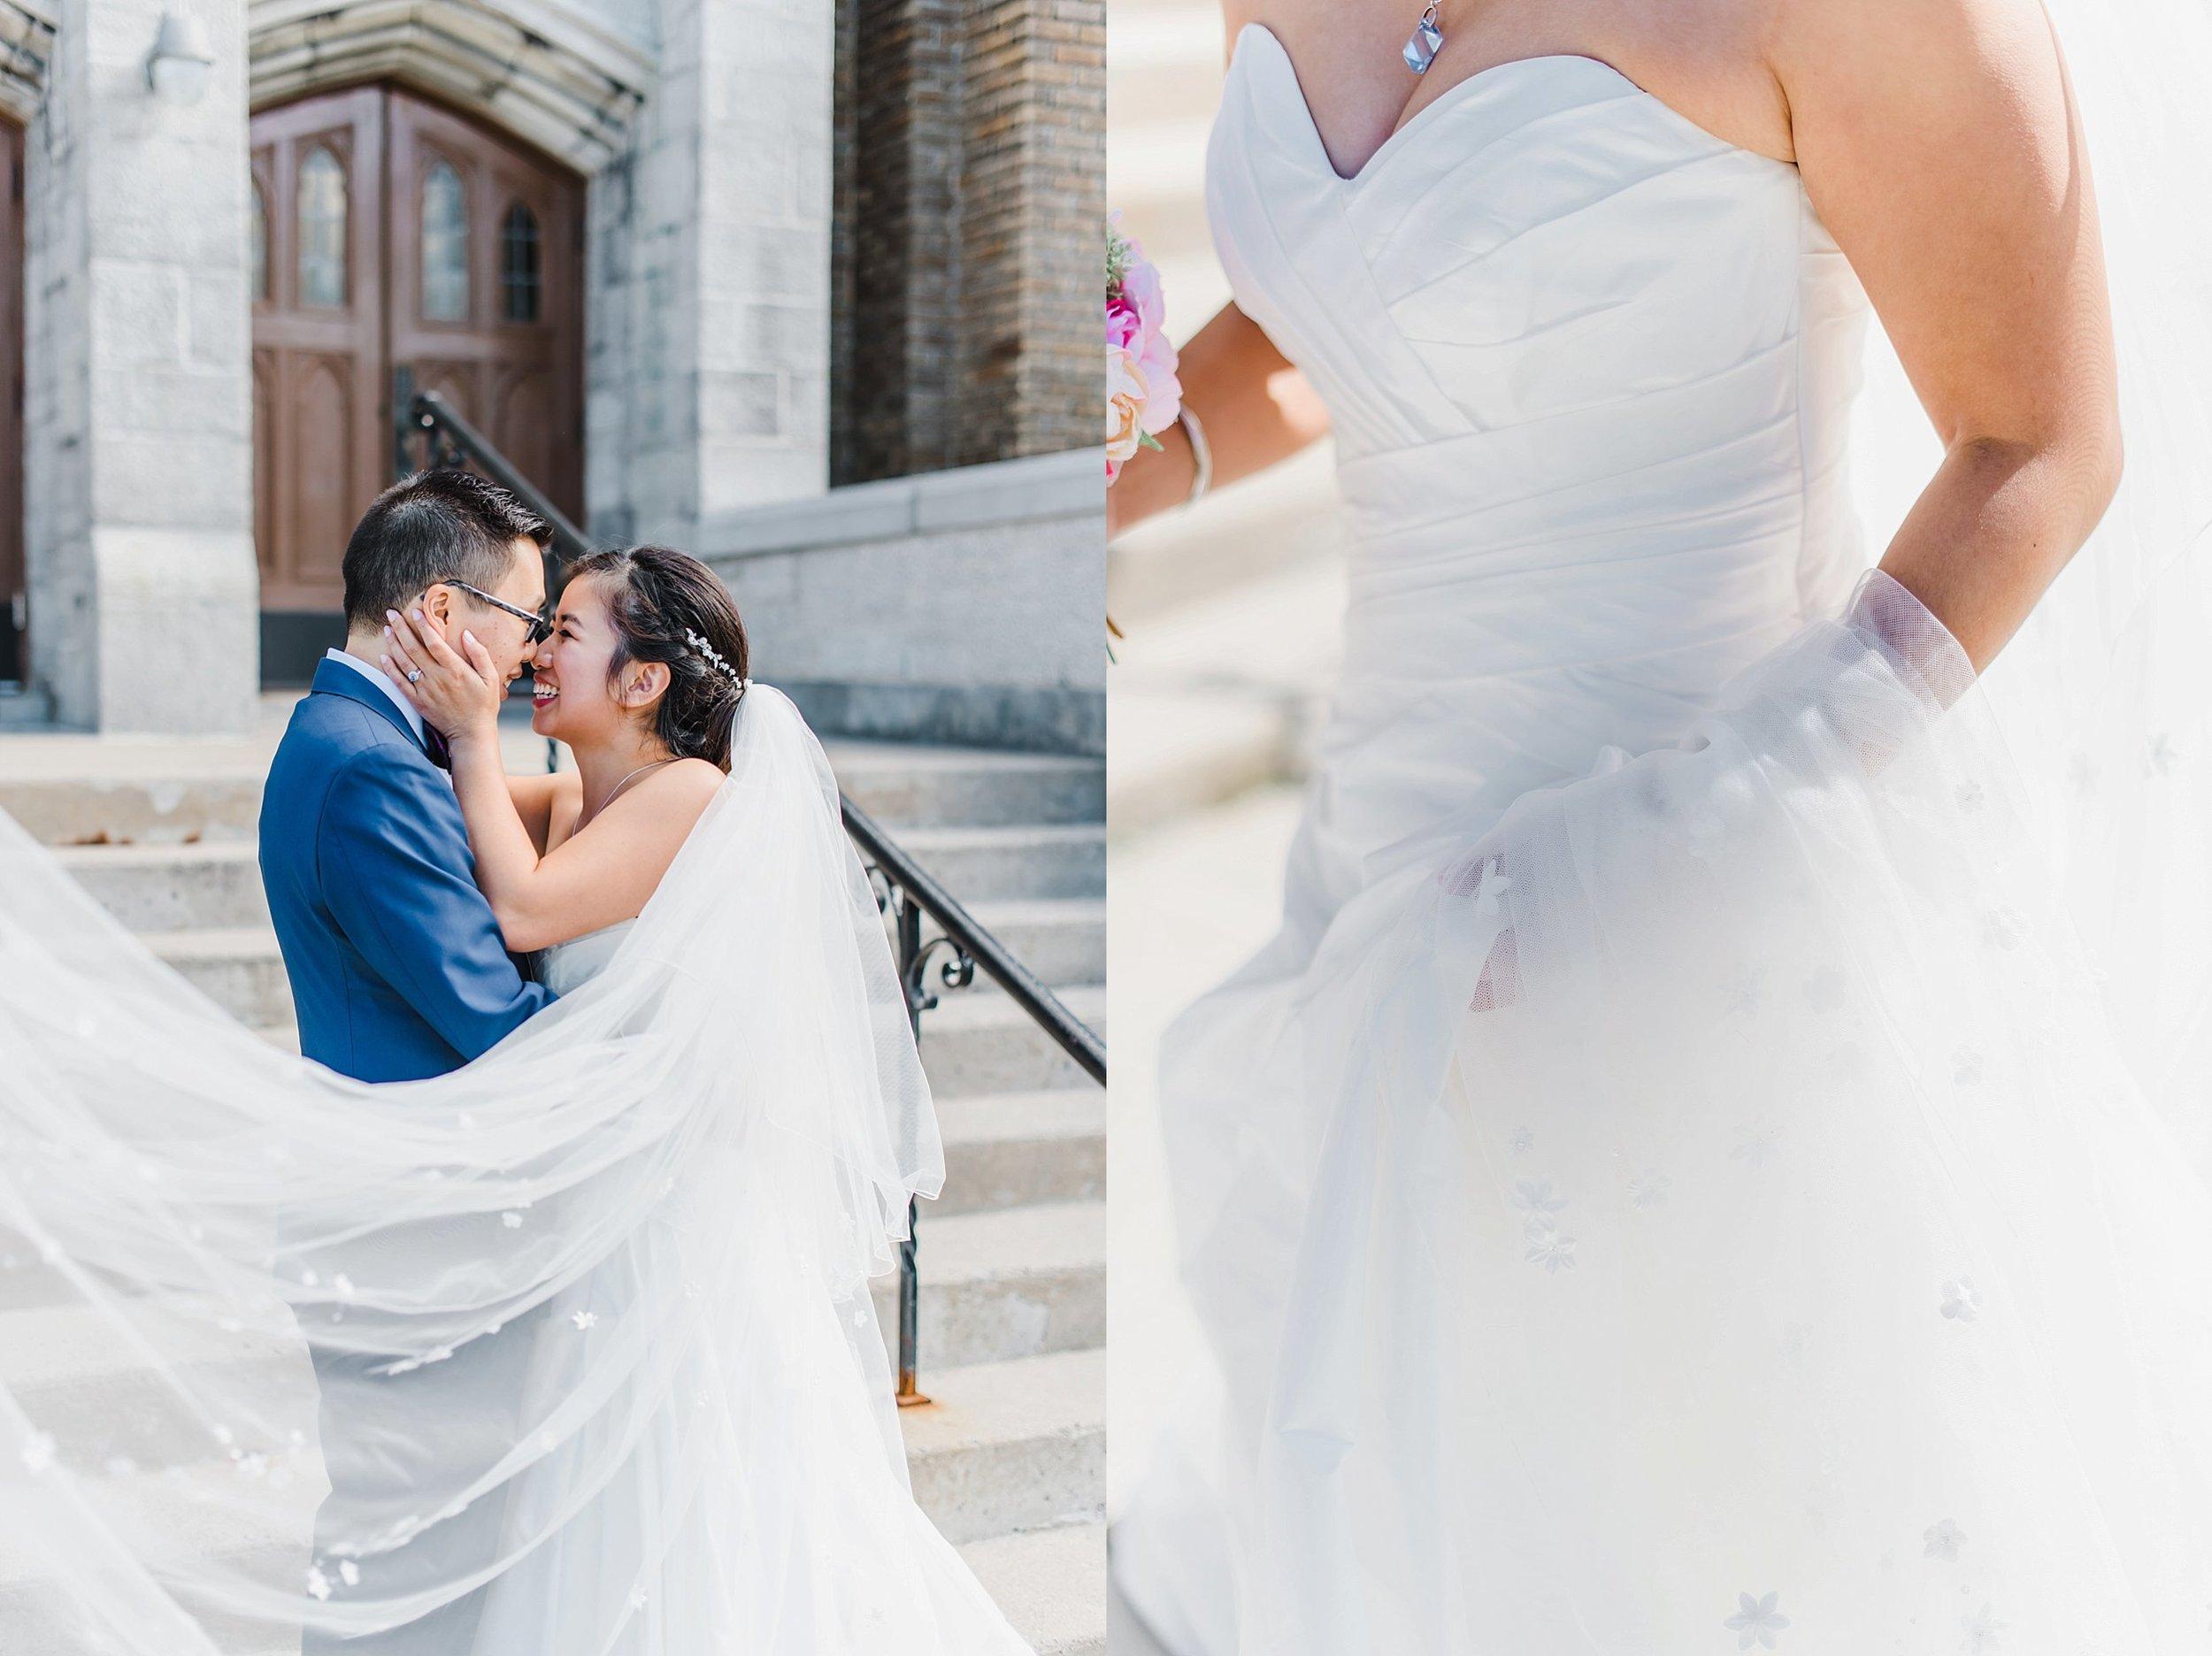 light airy indie fine art ottawa wedding photographer | Ali and Batoul Photography_1495.jpg